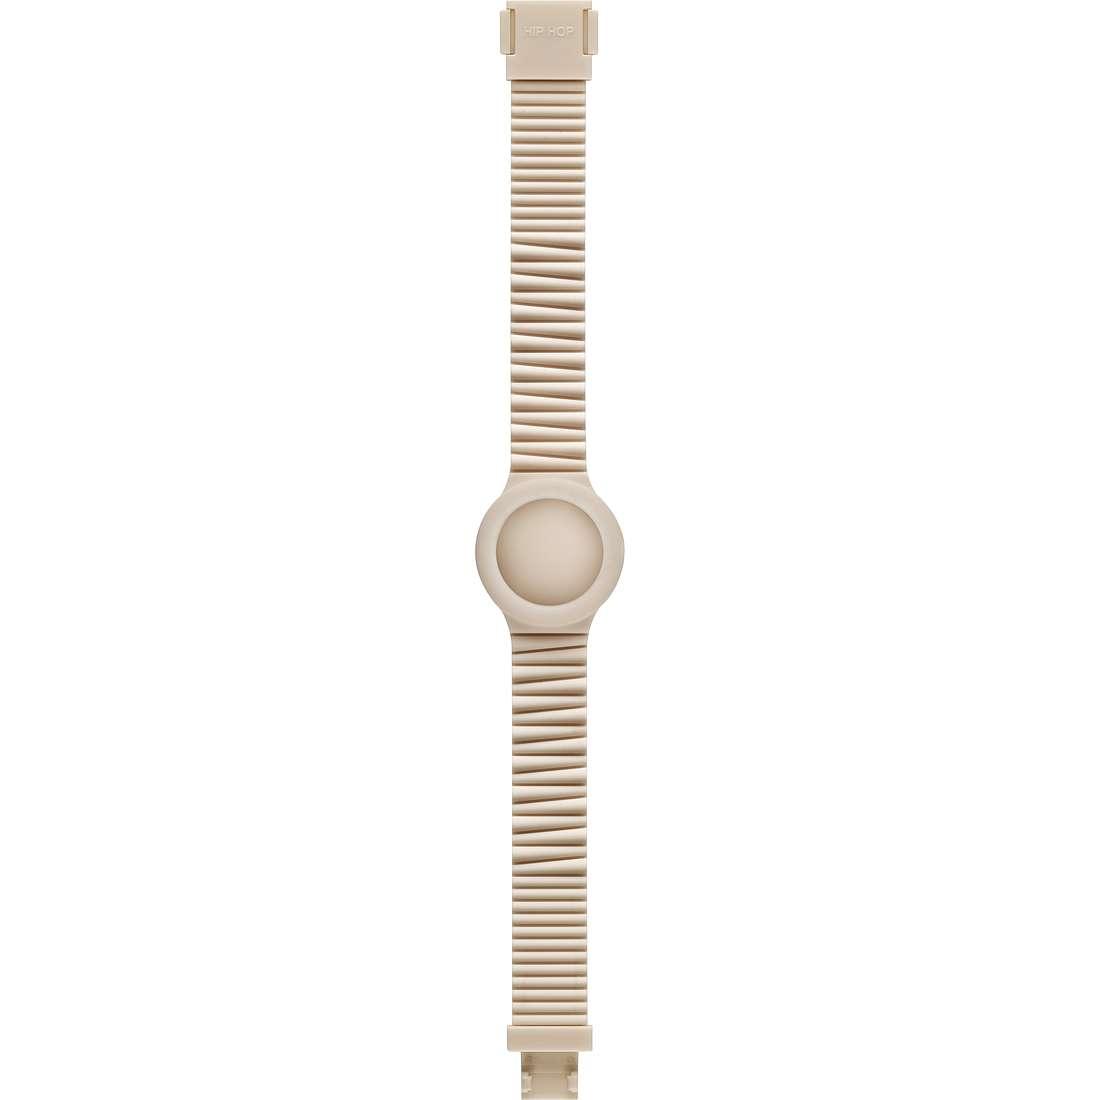 orologio accessorio donna Hip Hop Sensoriality HBU0513